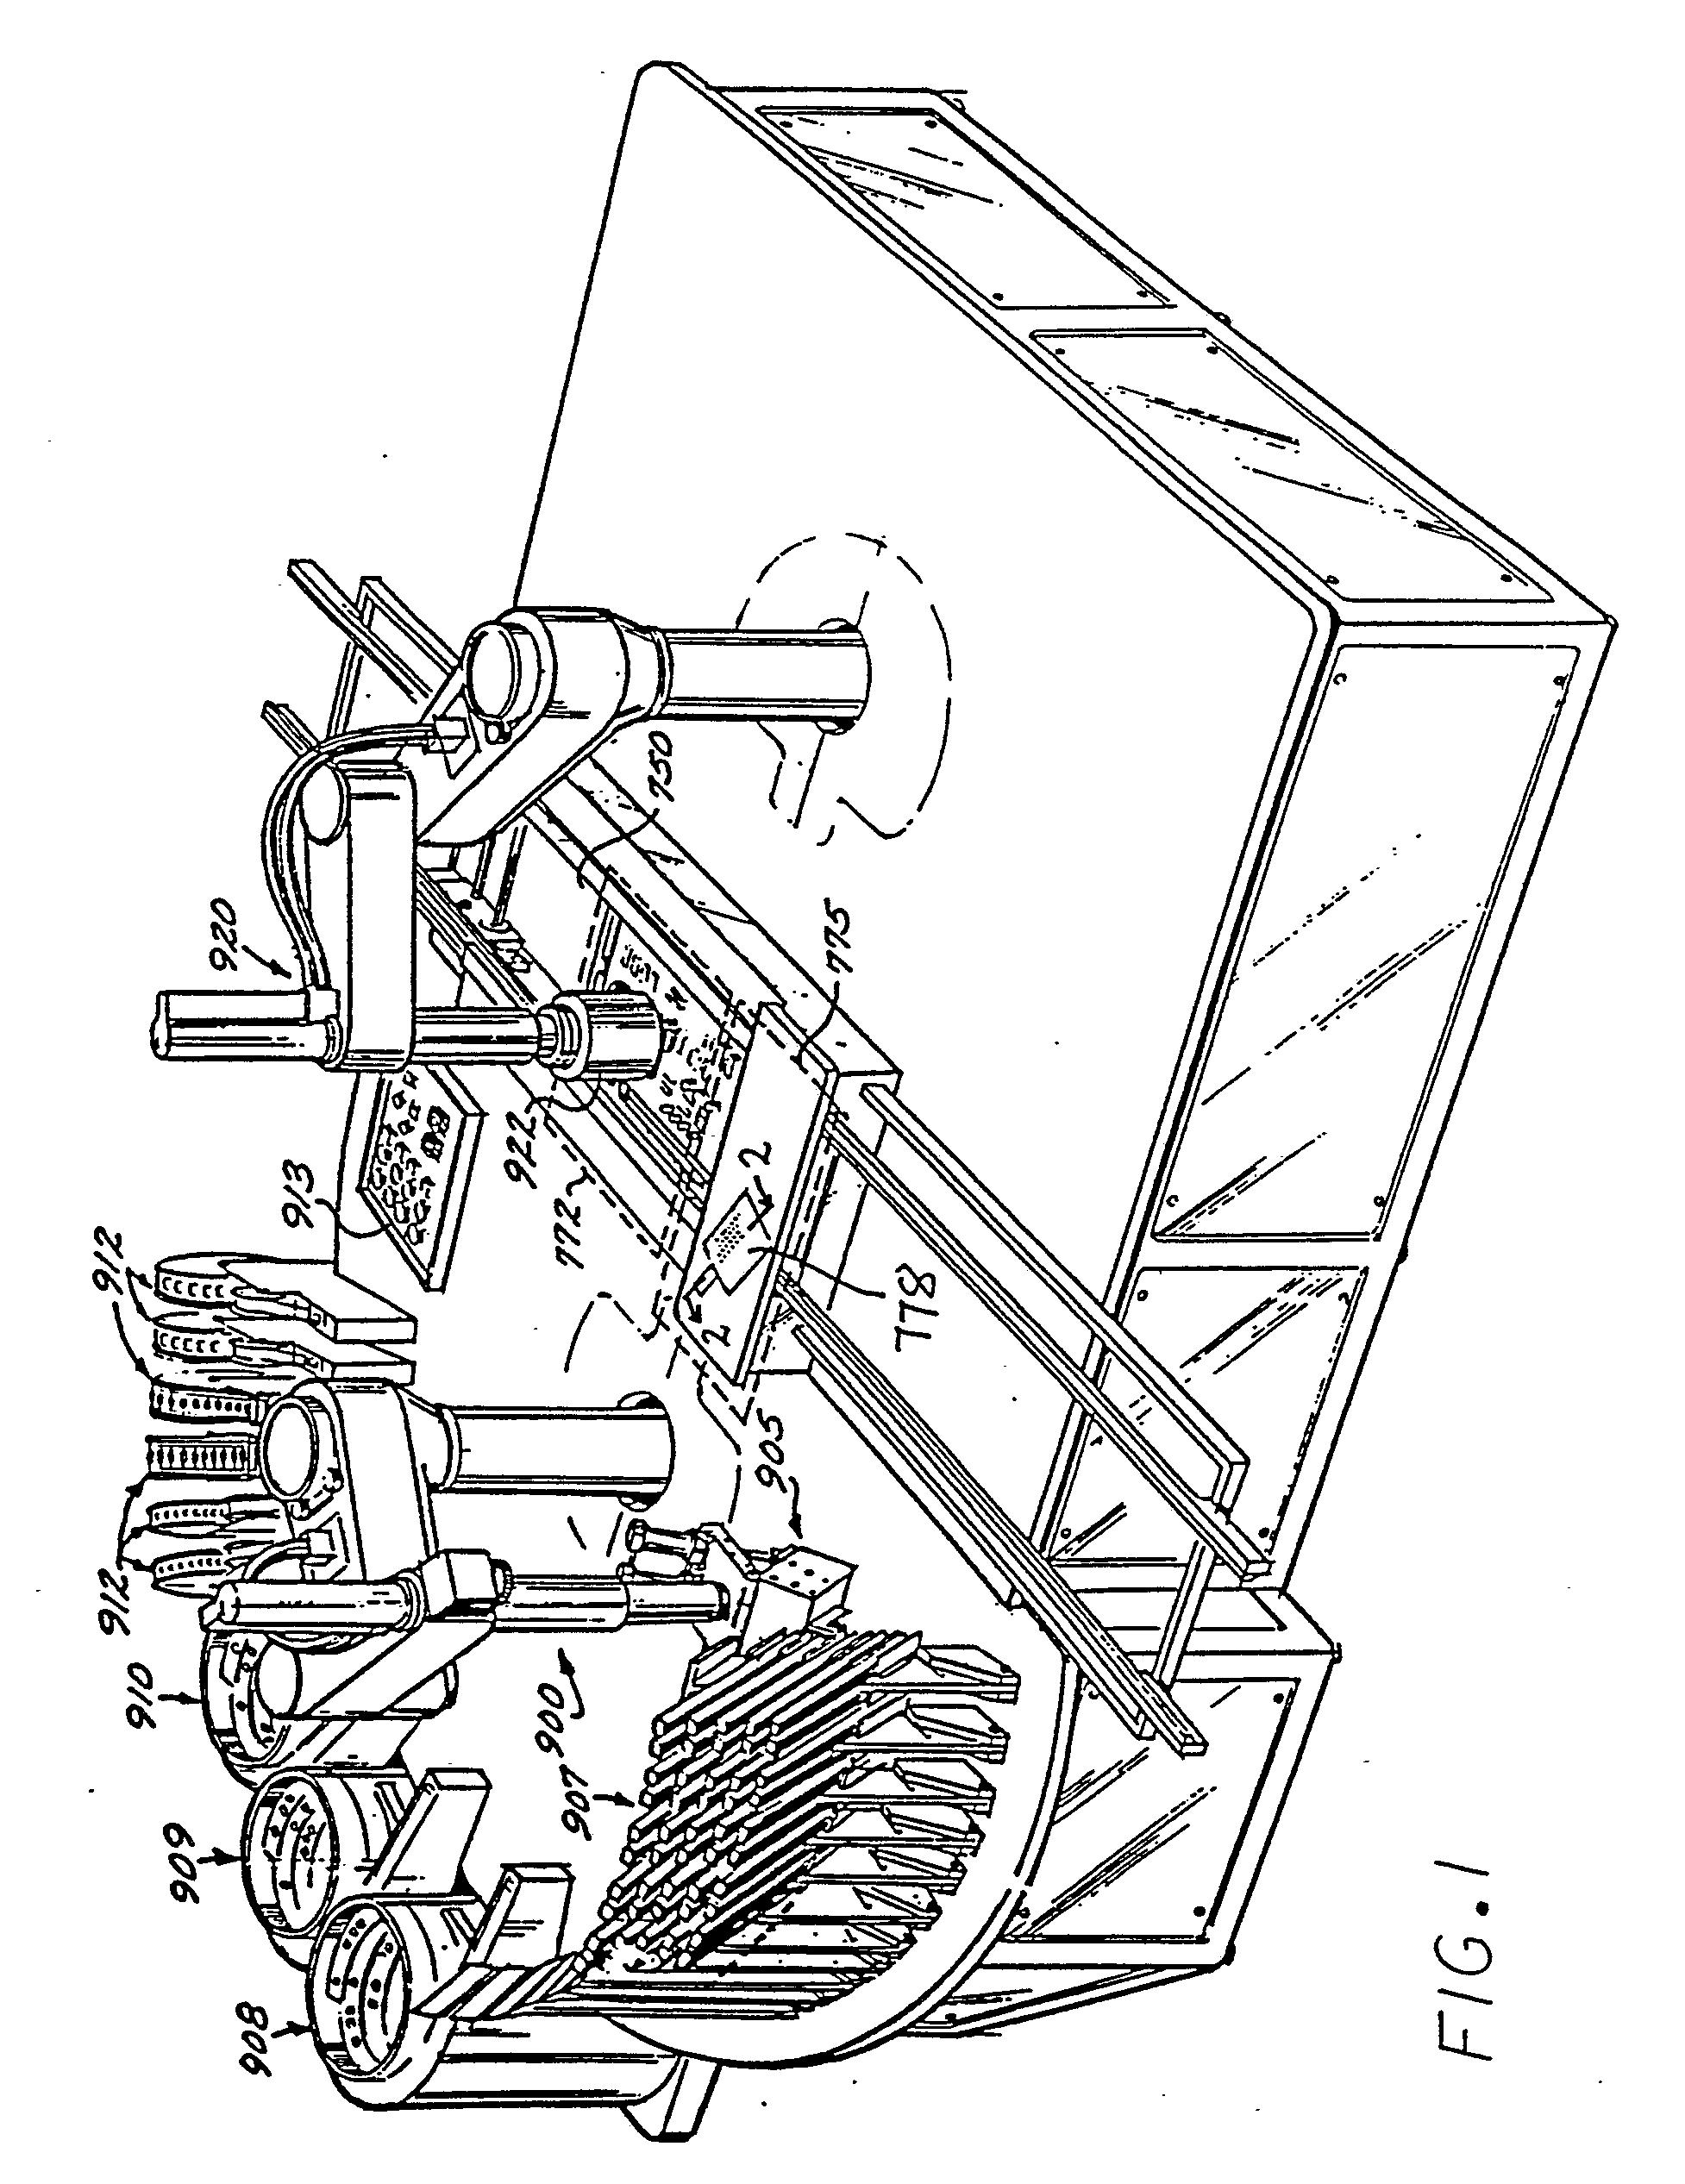 patent ep0318068a1